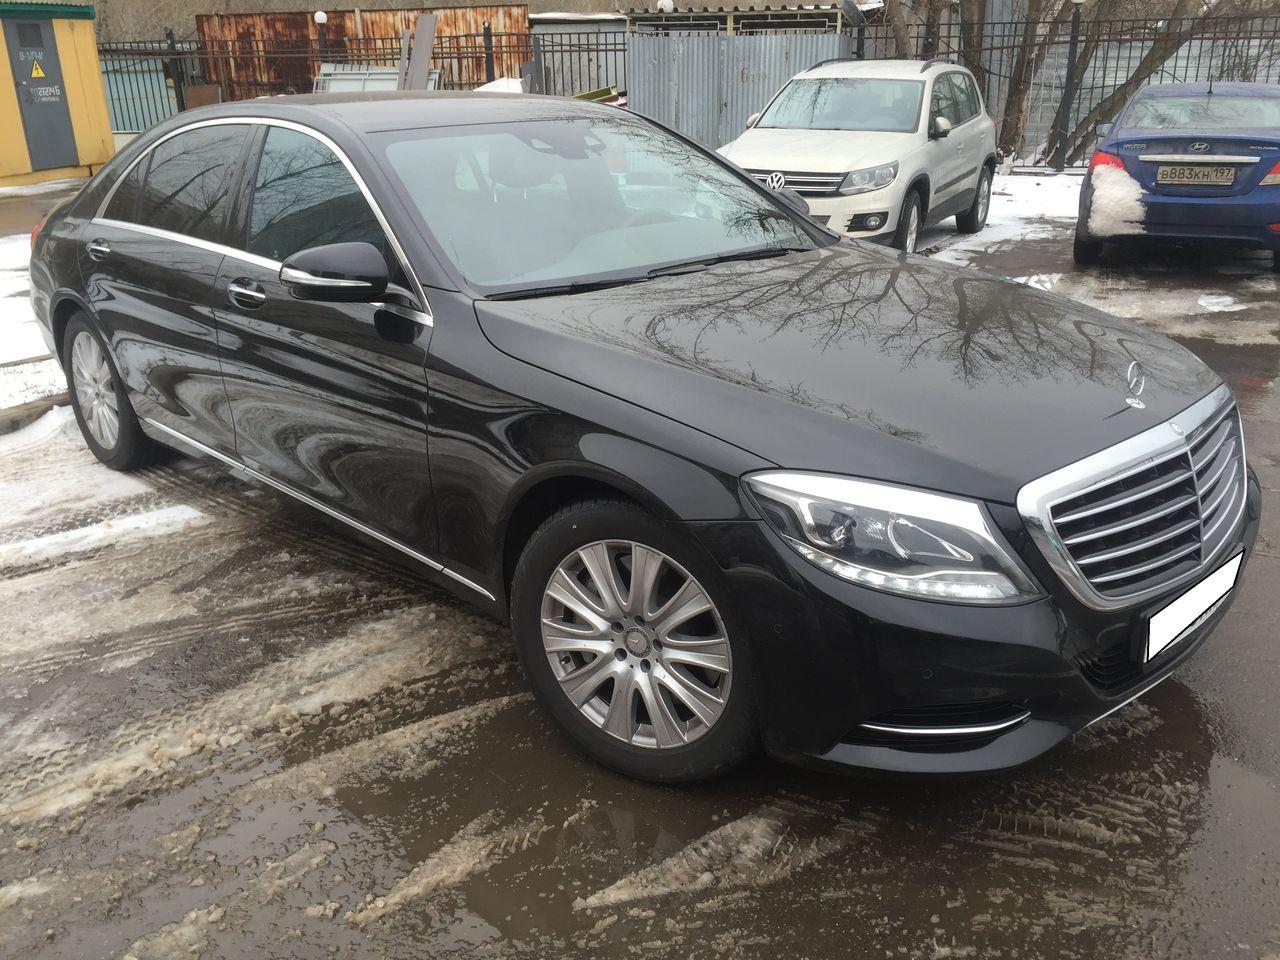 Аренда Vip автомобилей Киев. Mercedes S-class w222